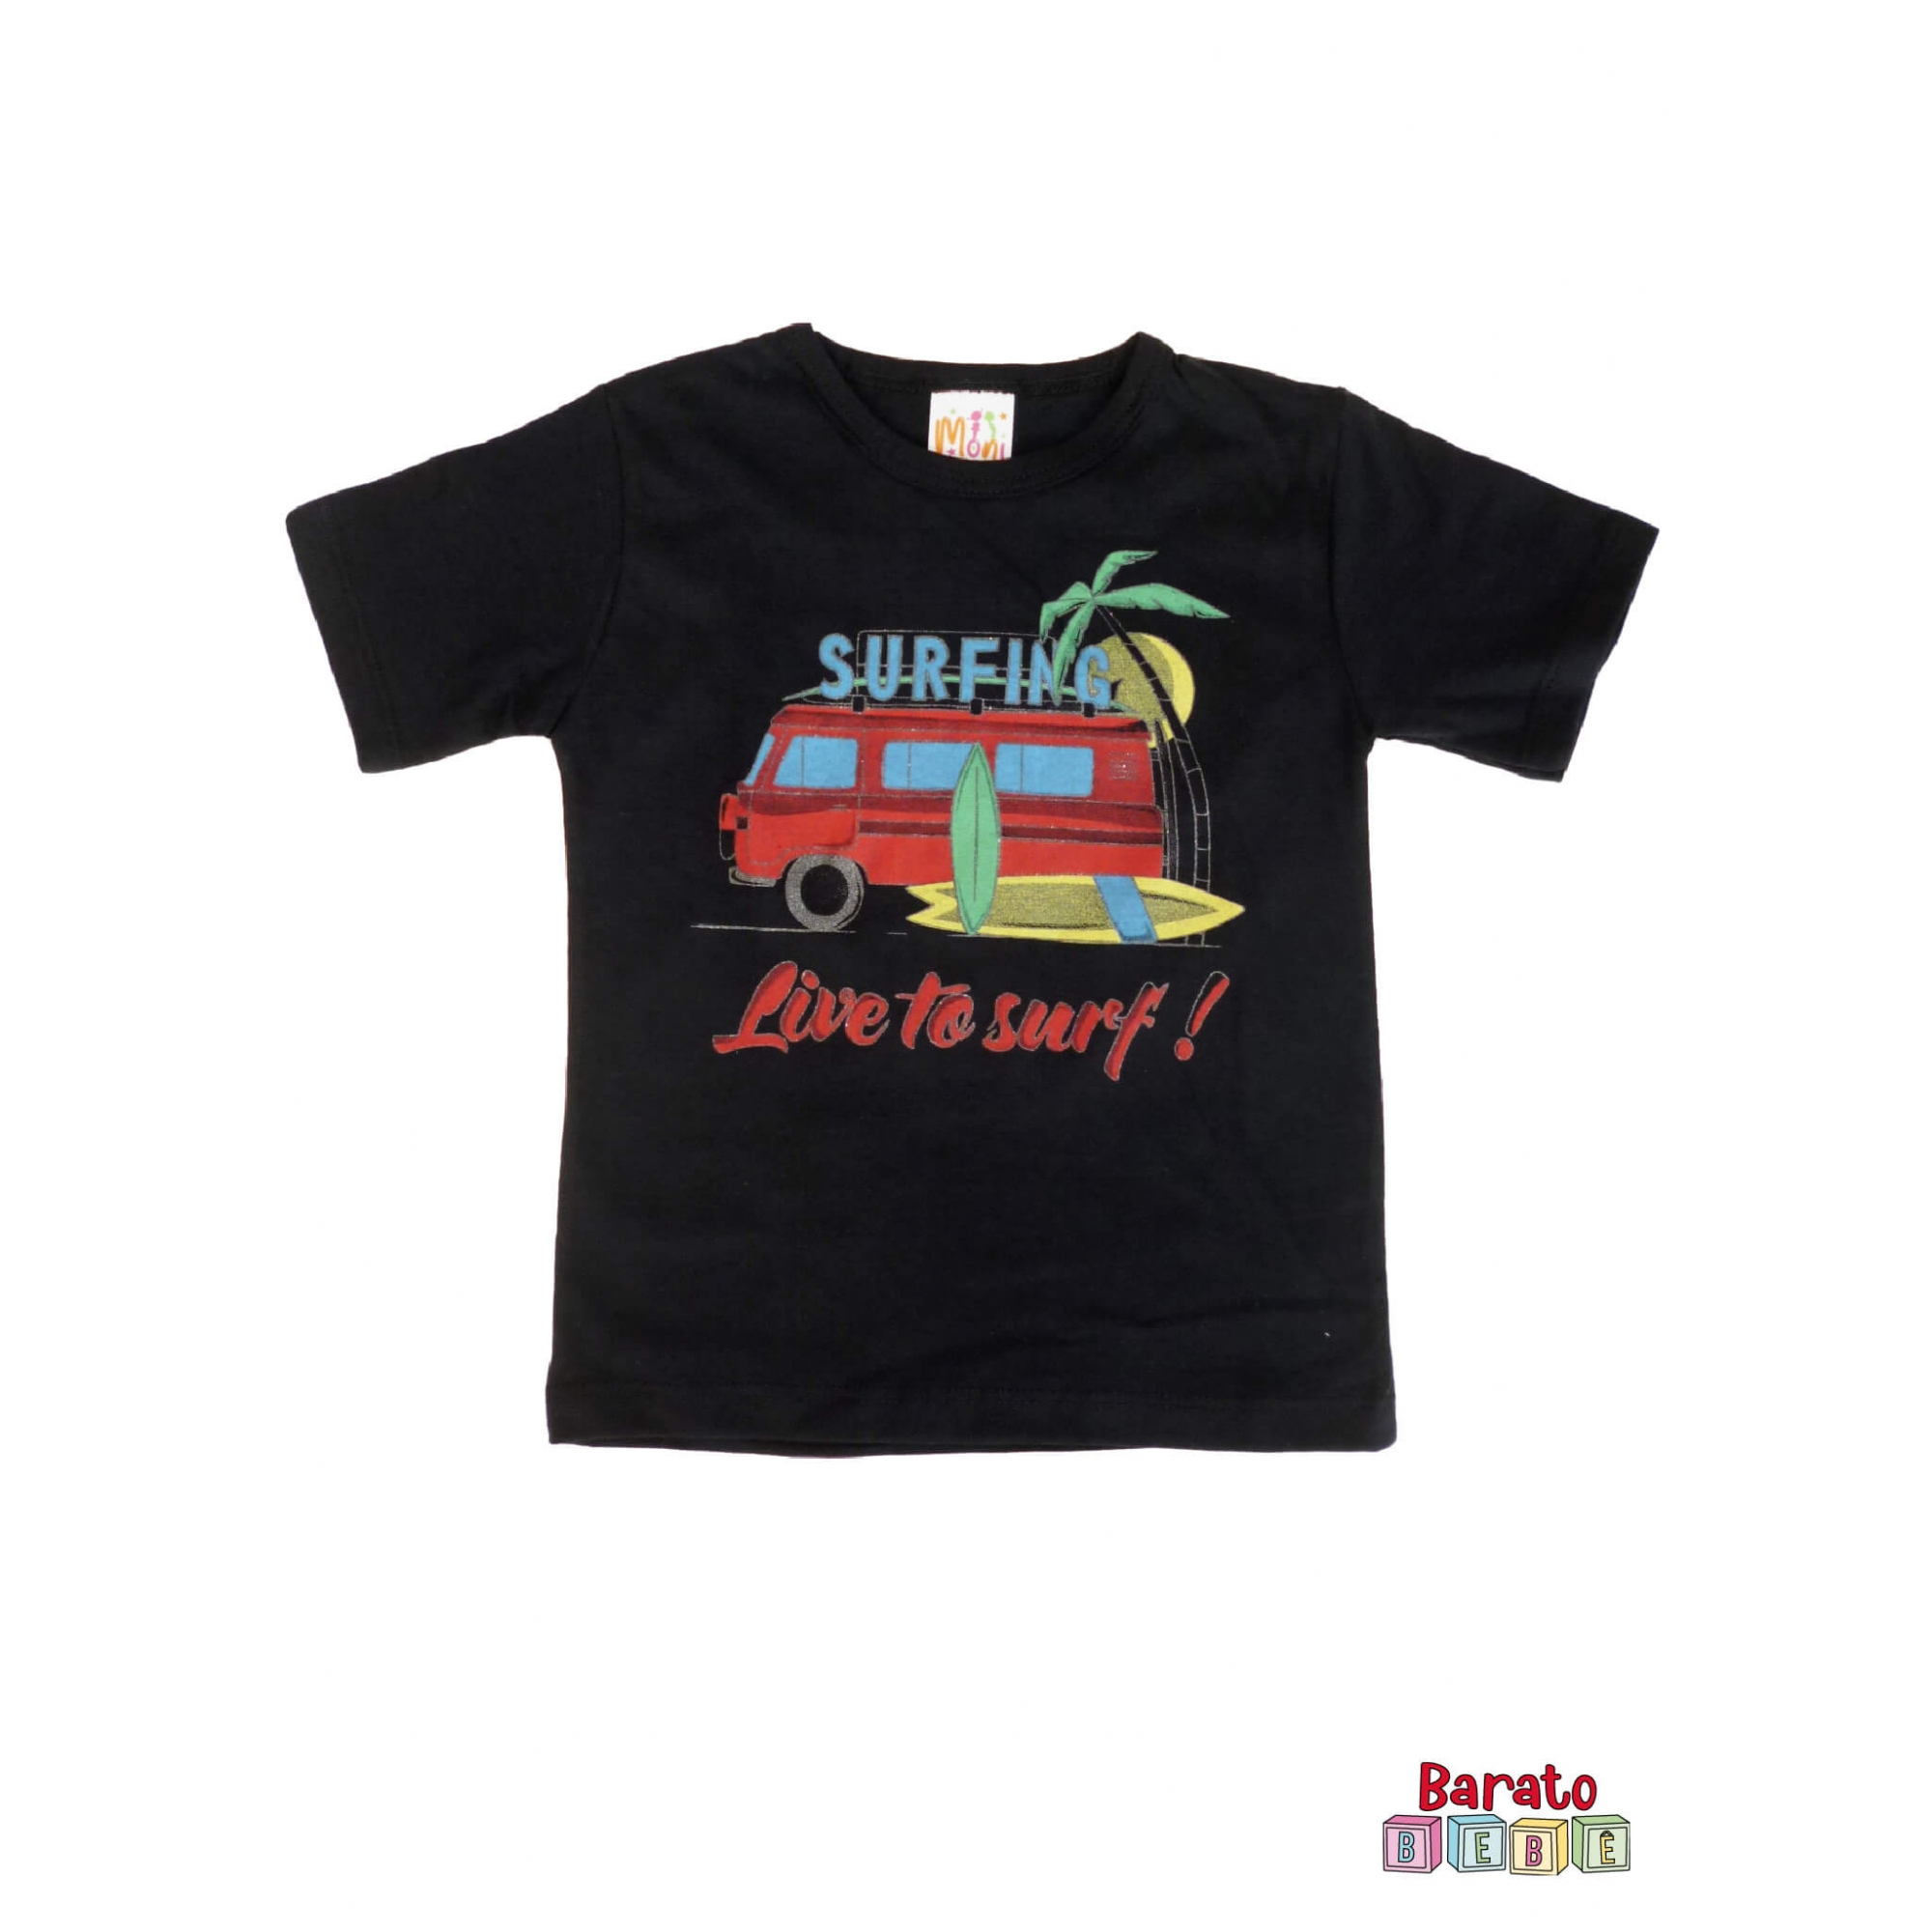 Conjunto Infantil Menino Preto - Surfing